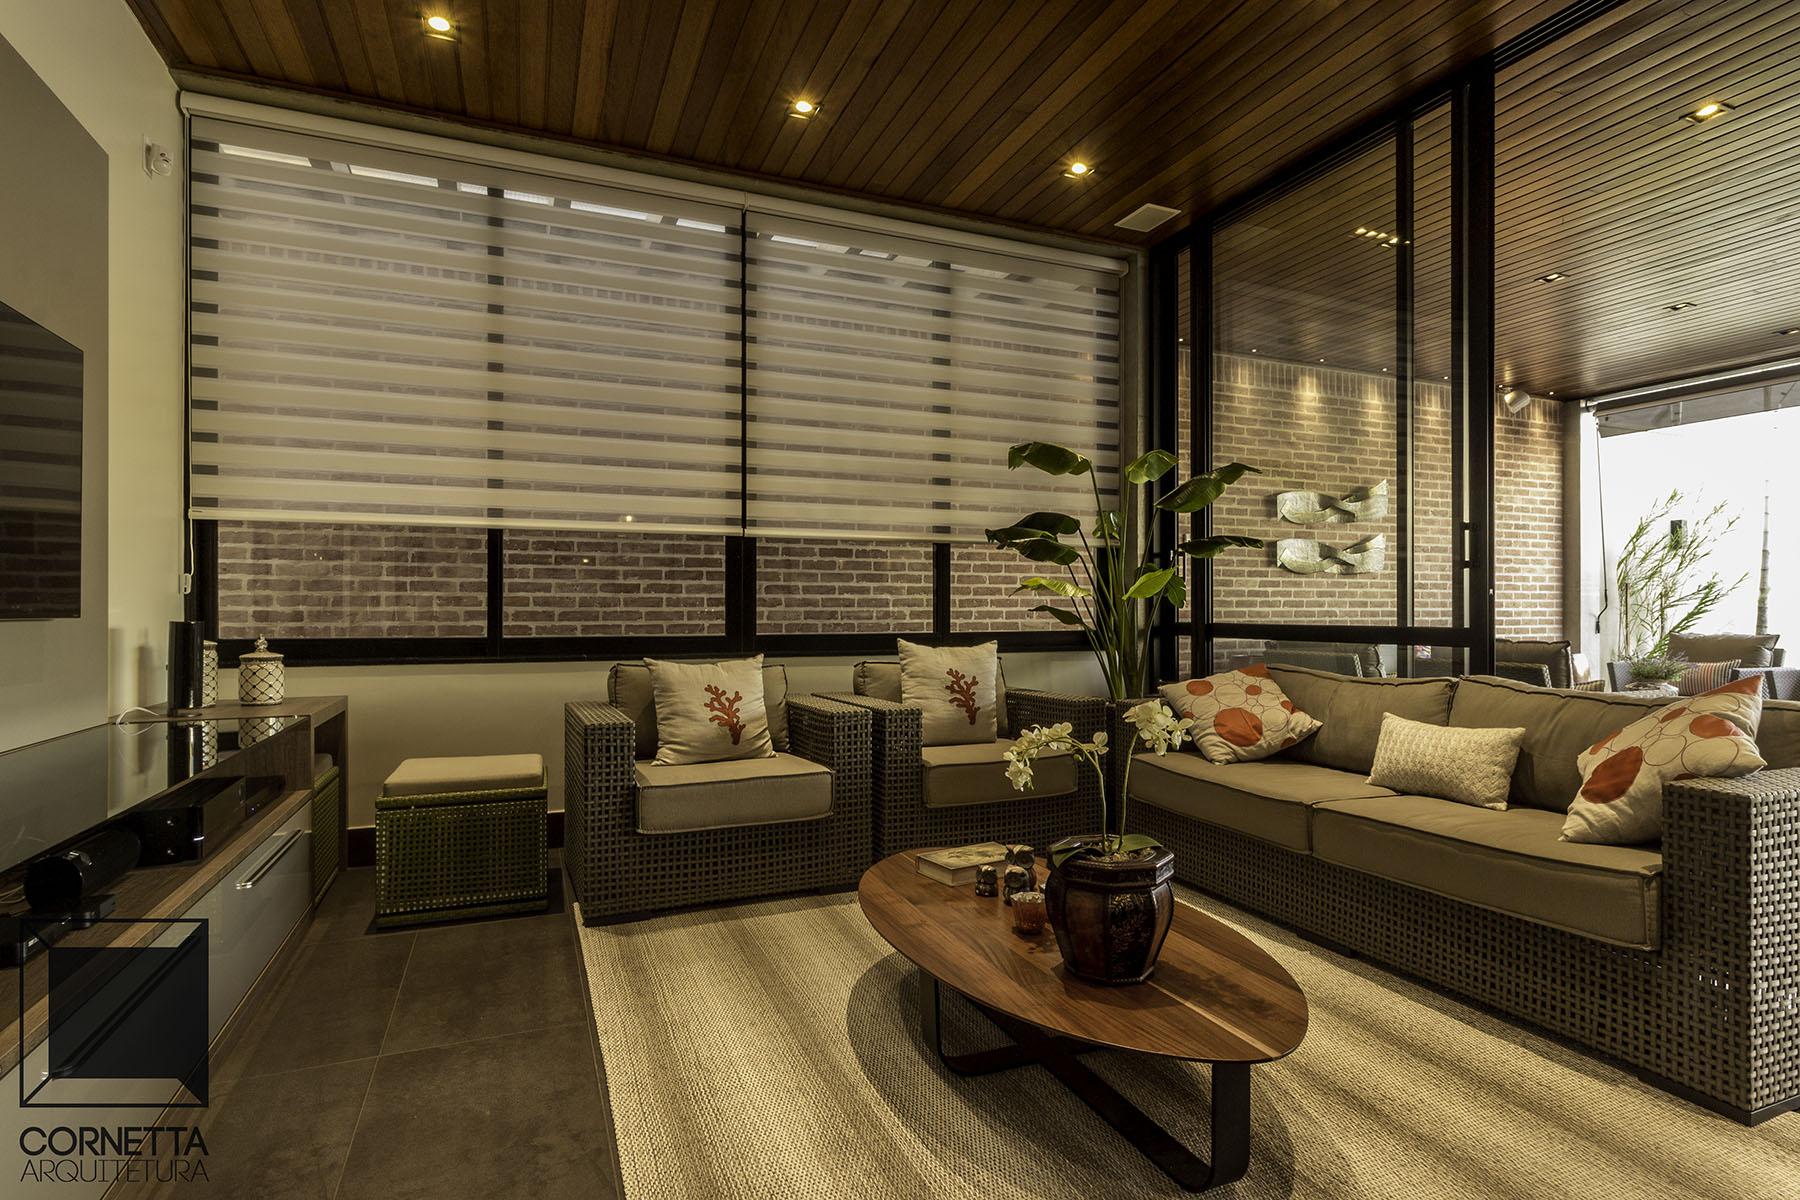 Casa tf cornetta arquitetura for Casa moderna 200m2